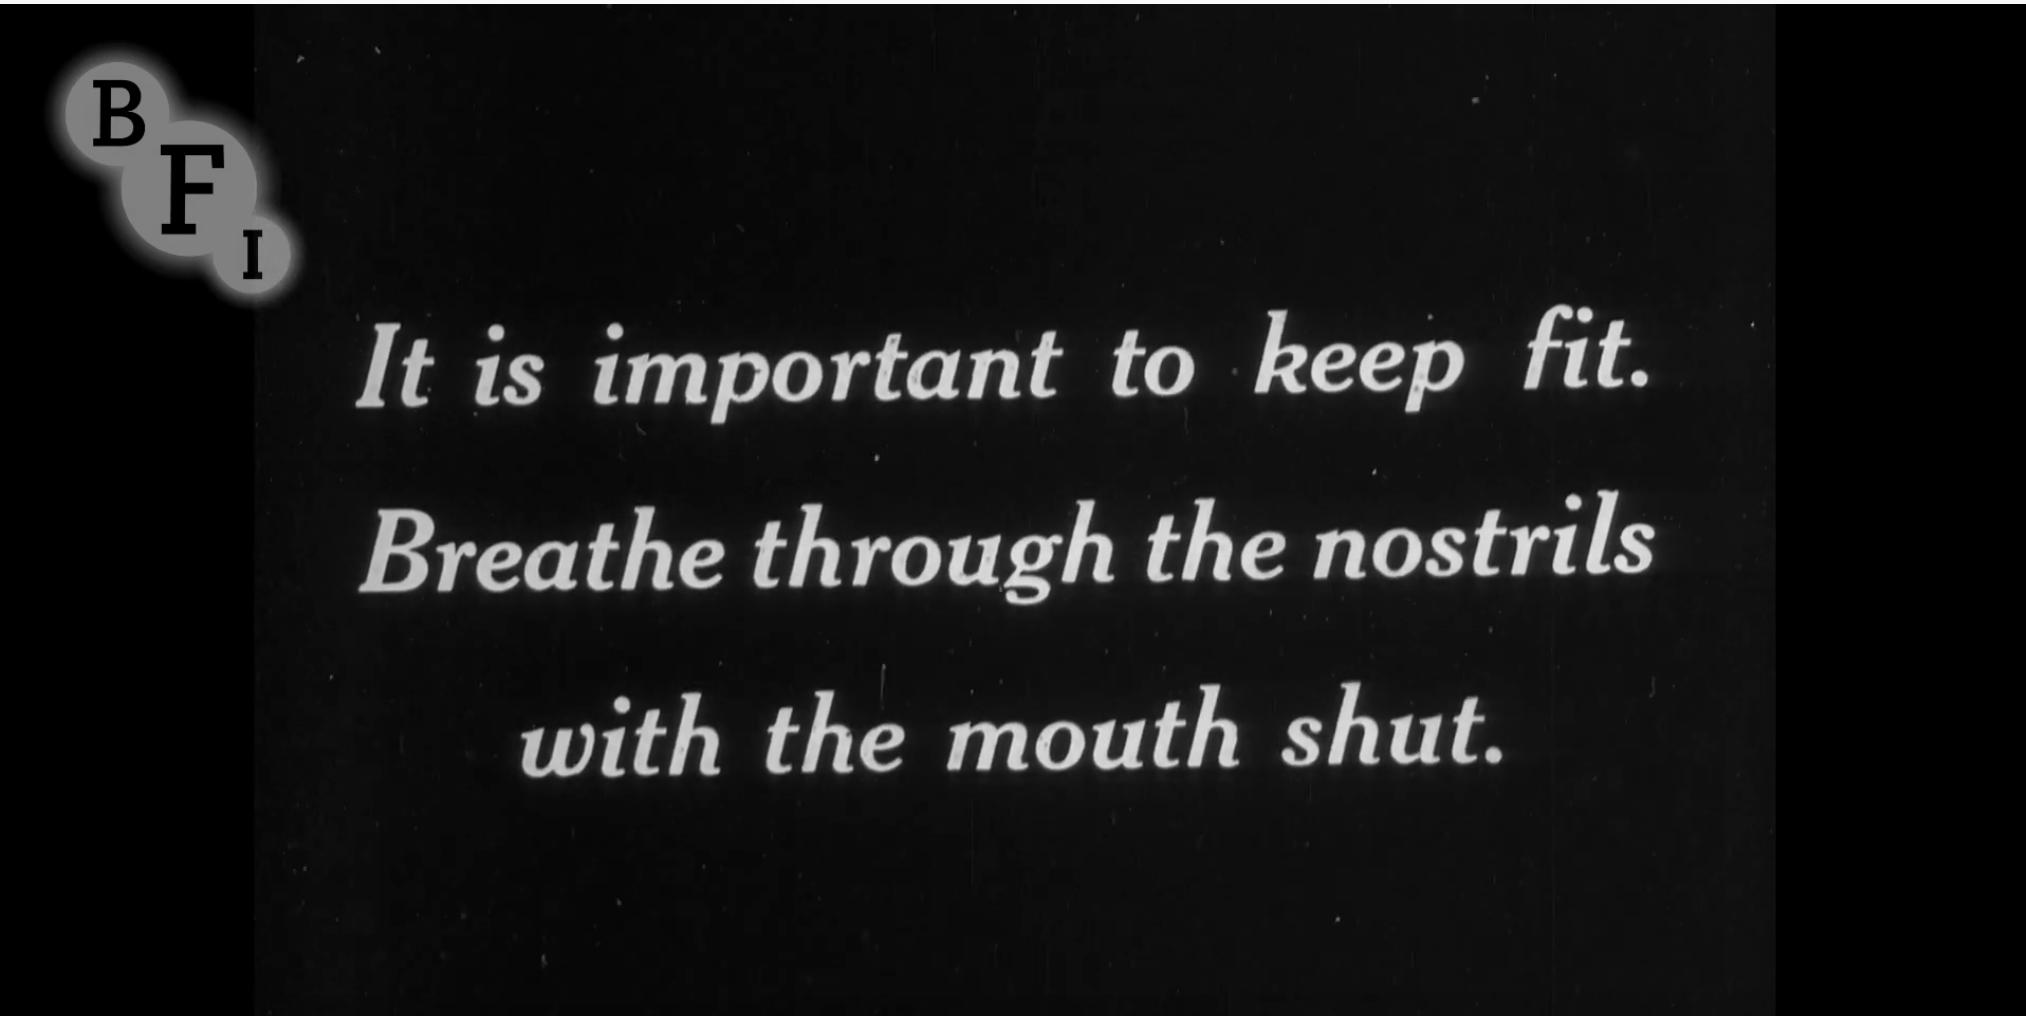 BFI 1919 Flu Pandemic Medical Advice